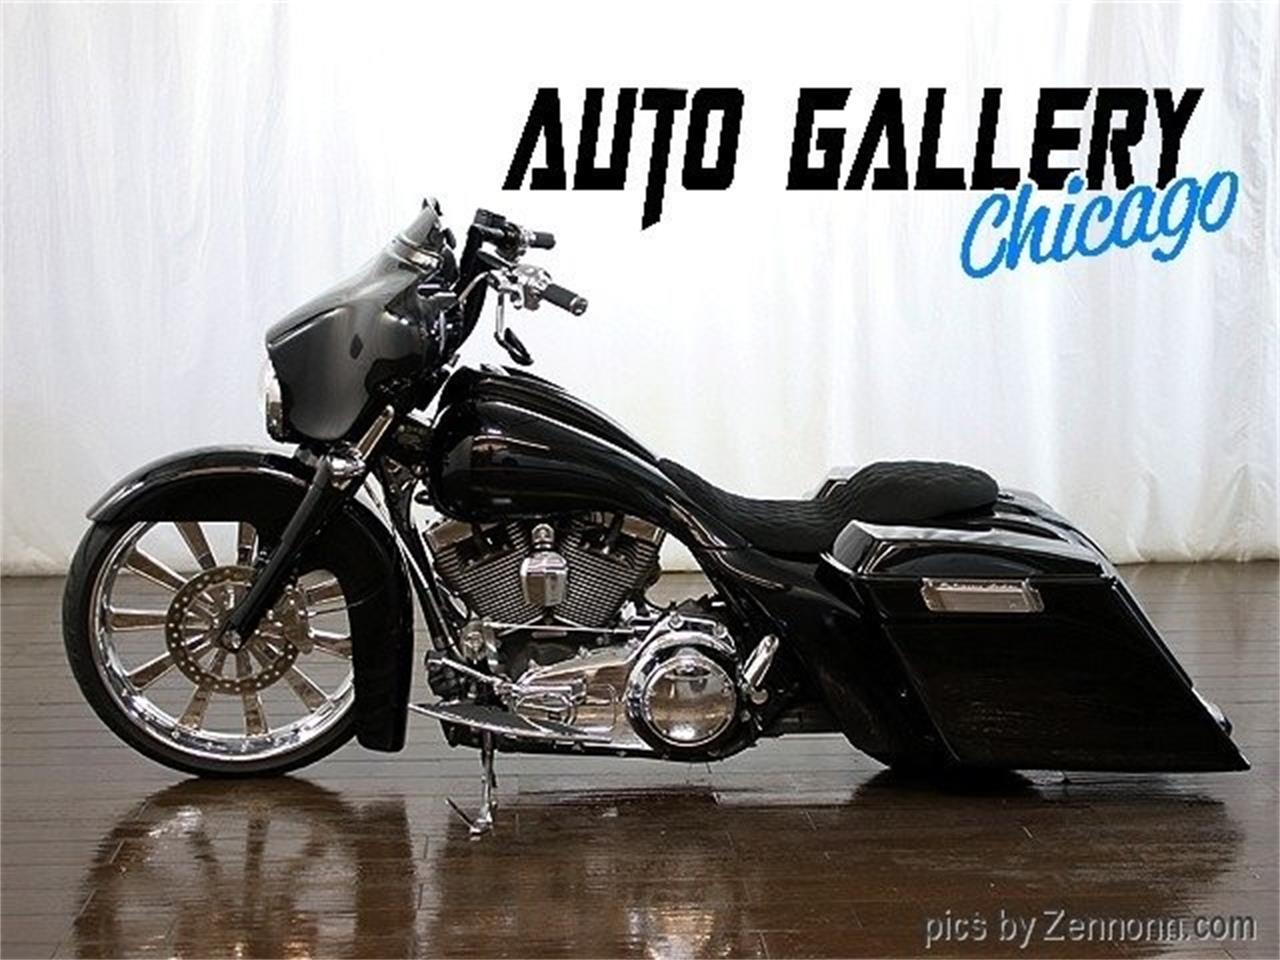 Street Glide For Sale >> For Sale 2007 Harley Davidson Street Glide In Addison Illinois